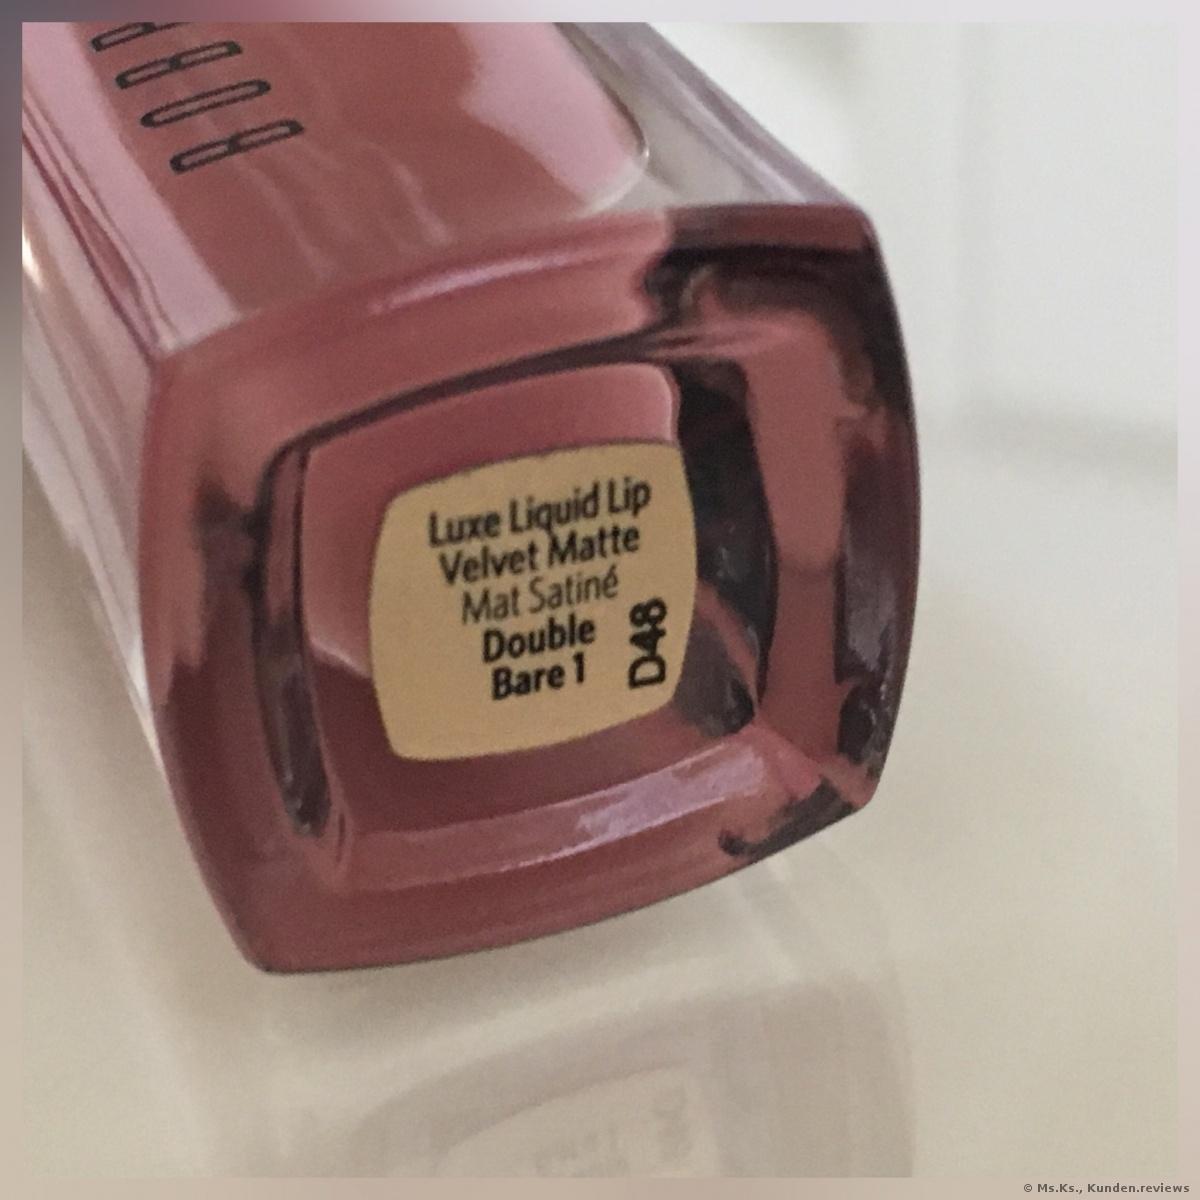 Bobbi Brown Luxe Liquid Lip Velvet Matte - Double Bare 1